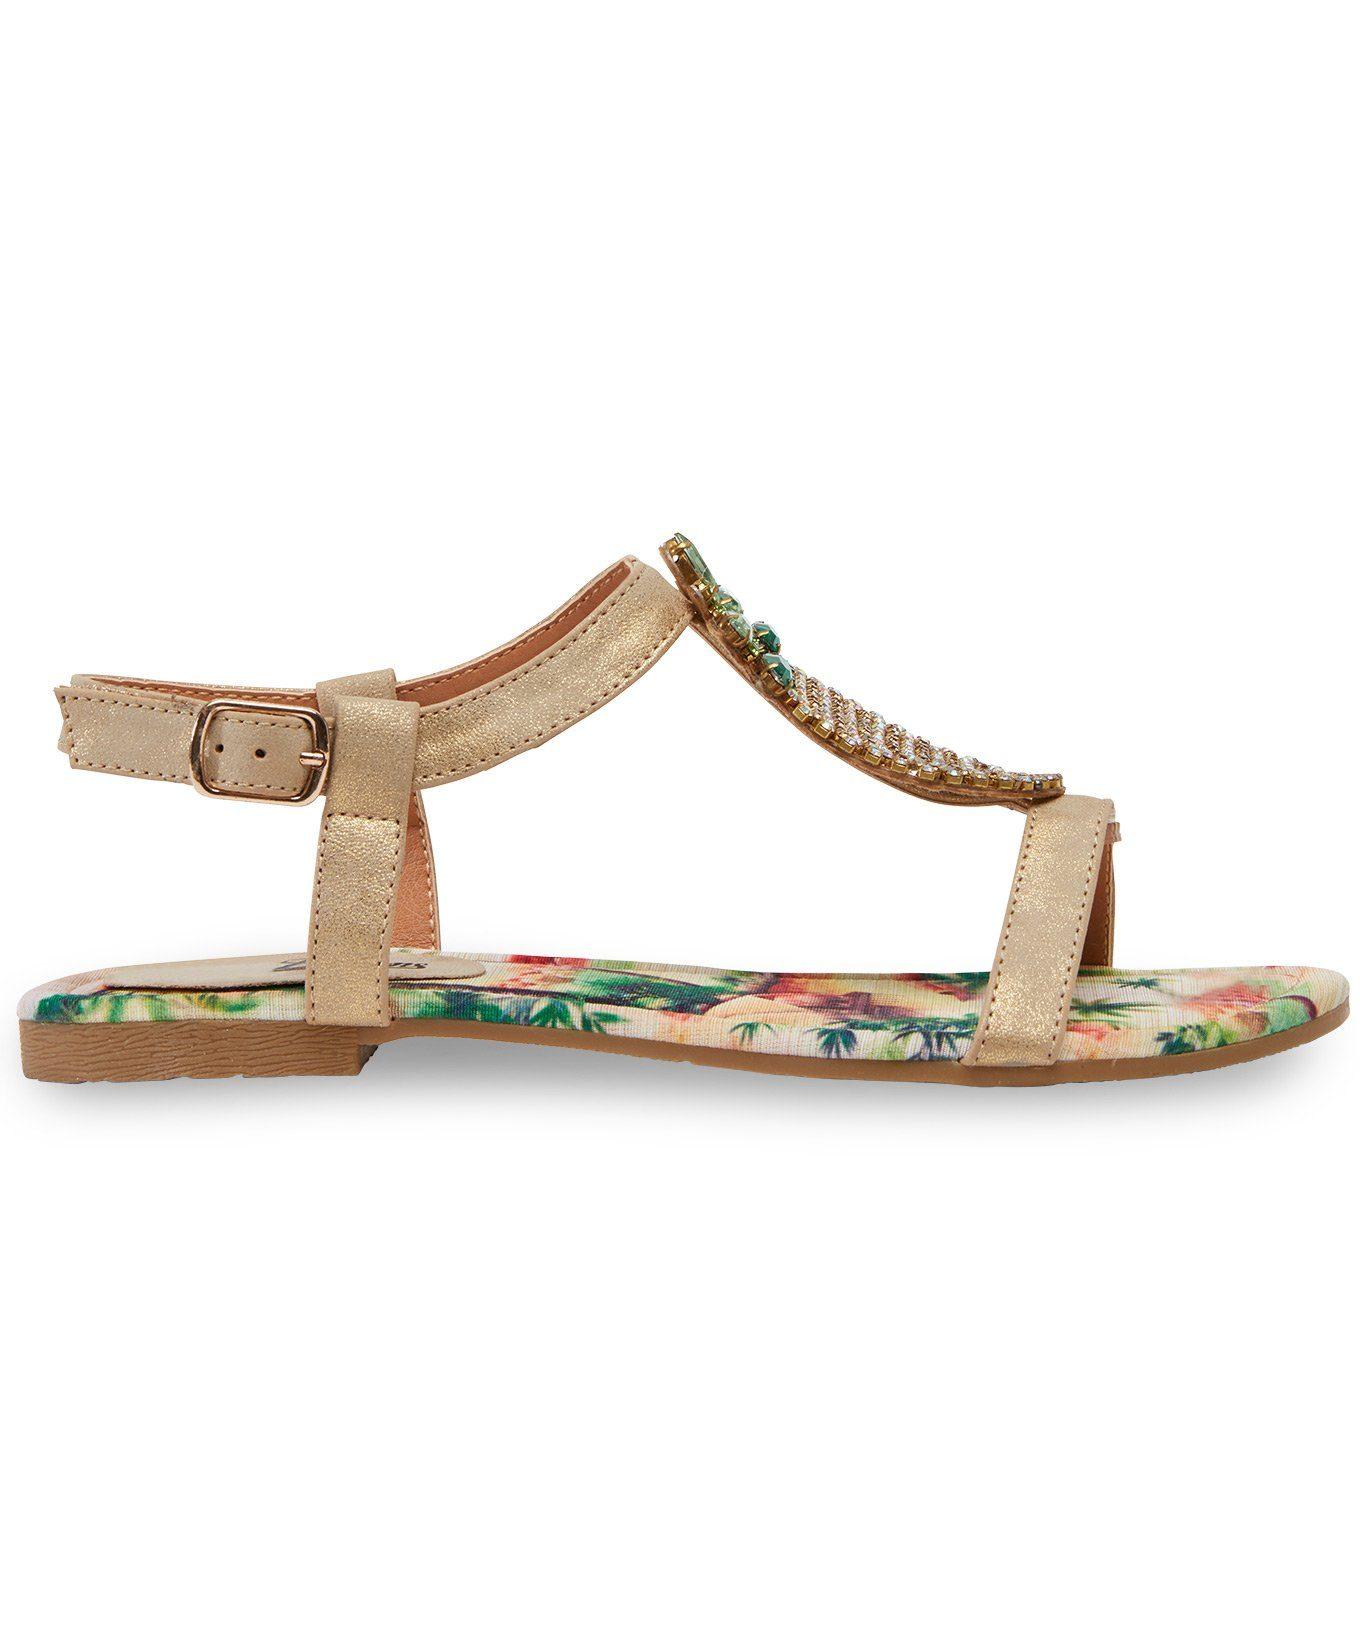 Joe Browns Sandale online kaufen  goldfarben